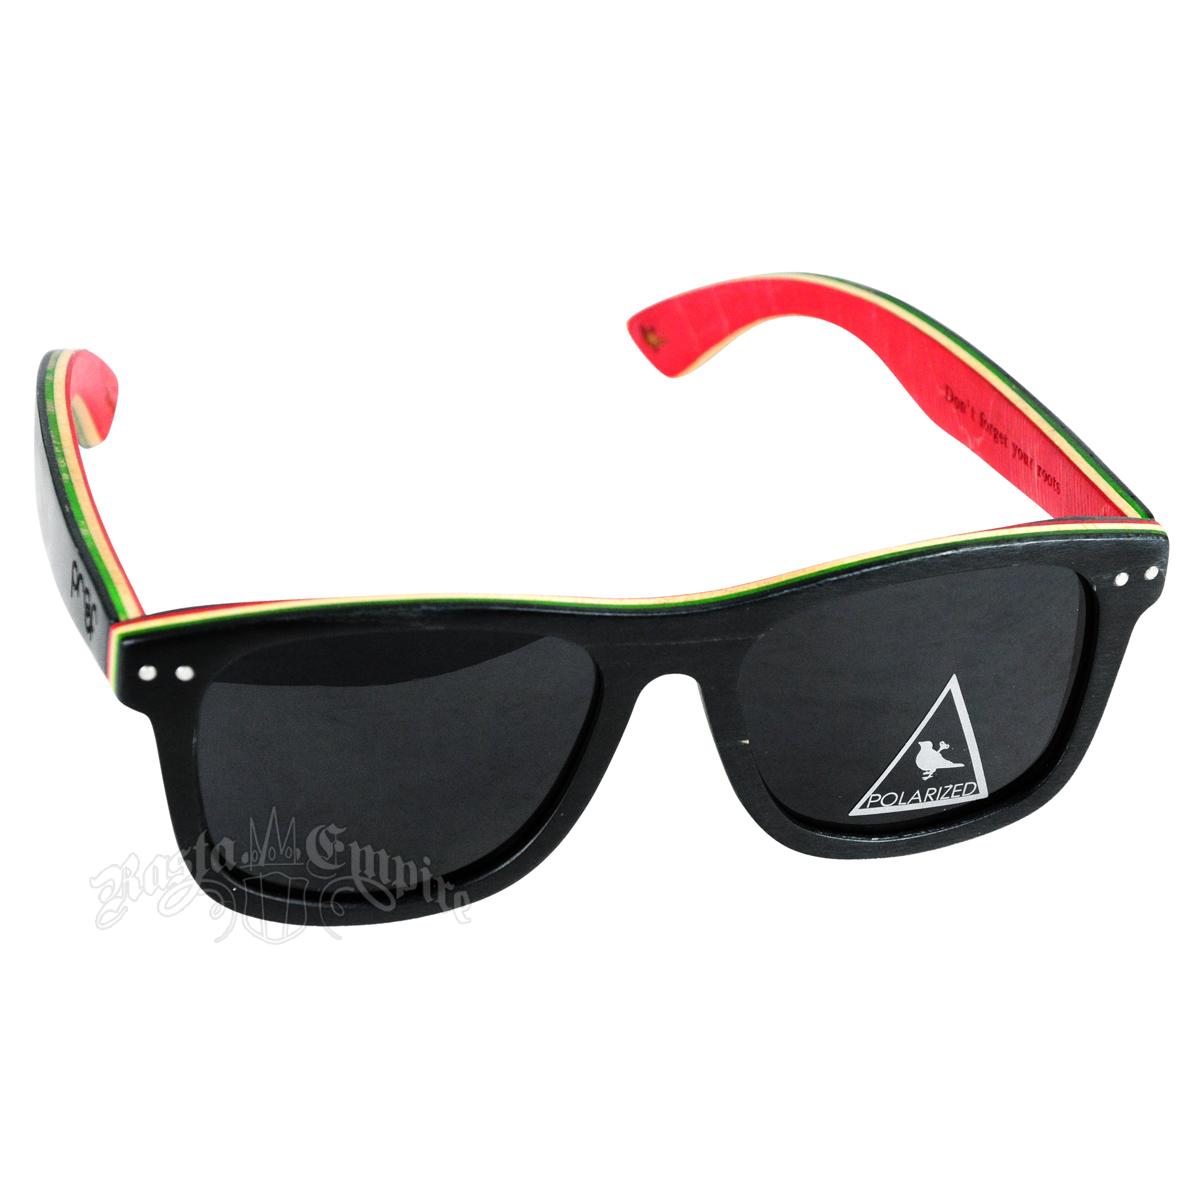 b1abf80e2a1c6 Rasta Rayban Style Sunglasses - Black. Rasta Polarized Ontario Skate  Sunglasses